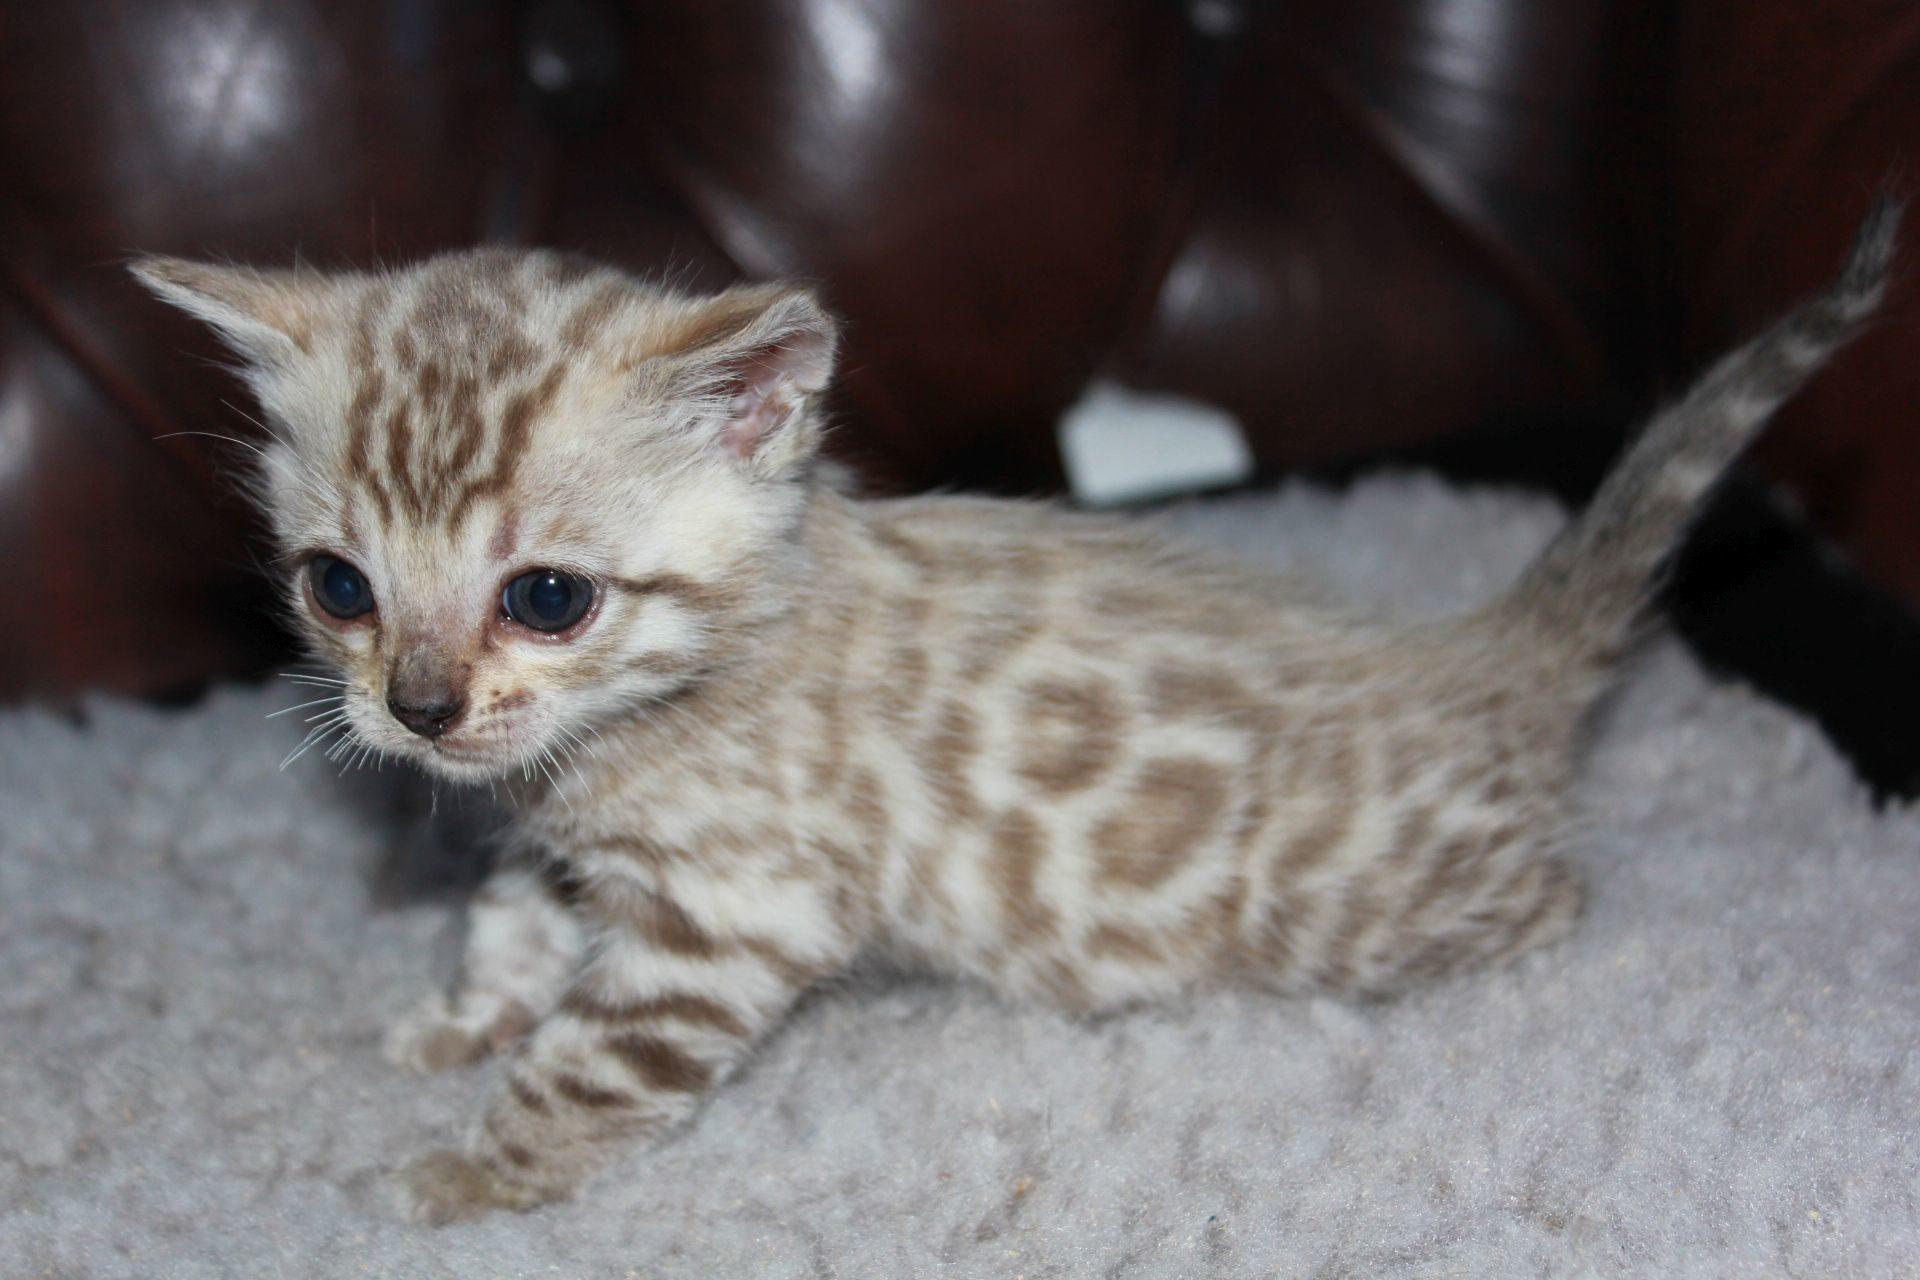 Photo 1 of el-capitan the Bengal kitten.